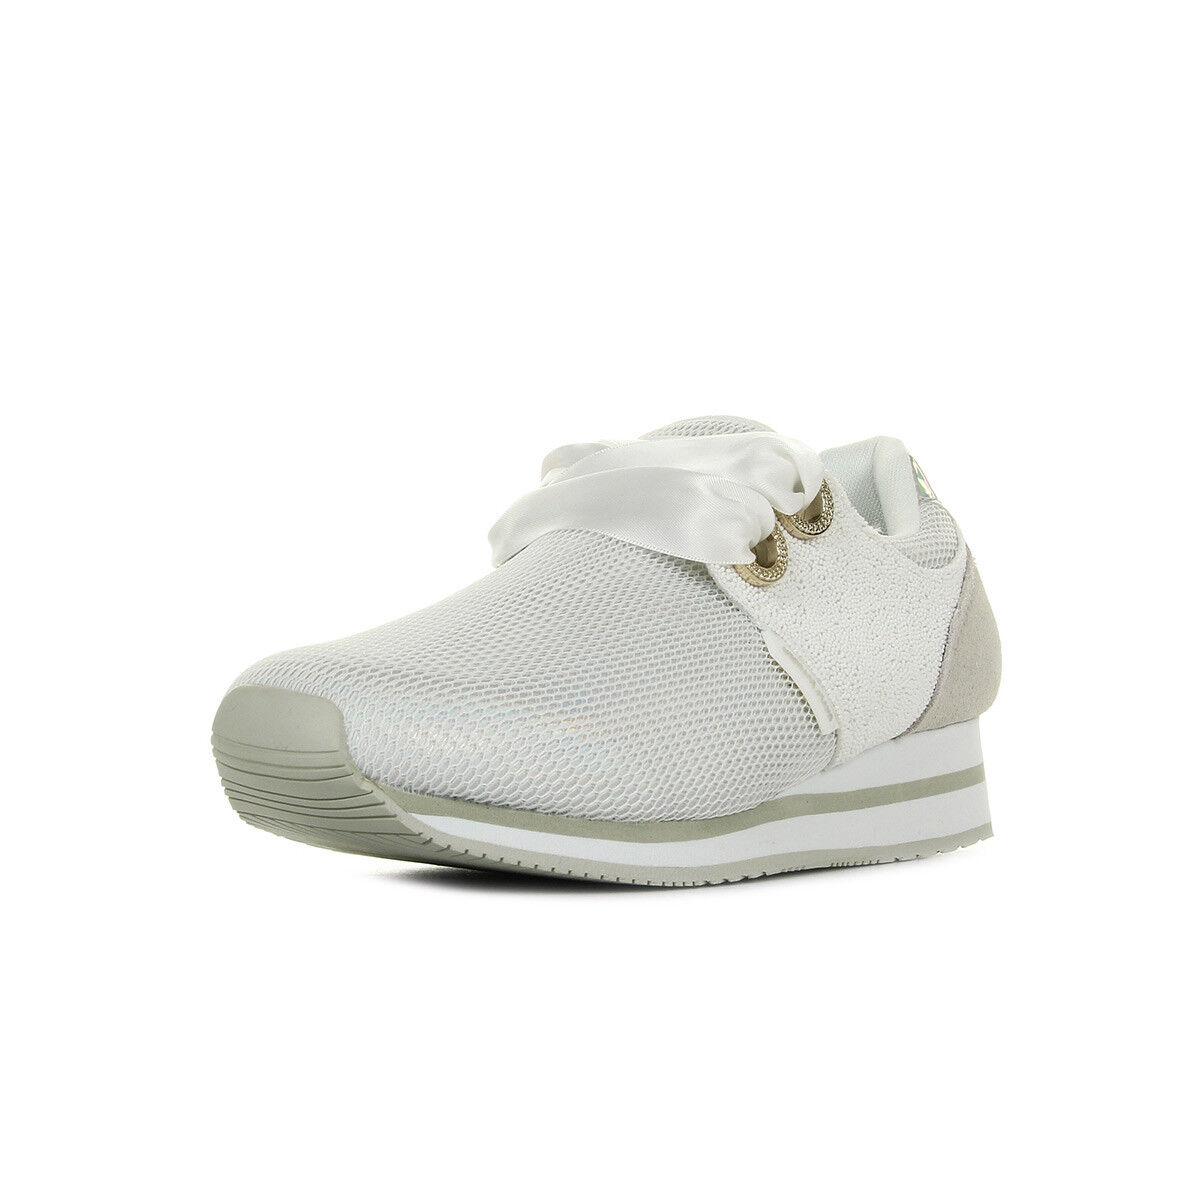 Schuhe Versace Jeans Damen Linea Fondo Stella Dis 3 weiß